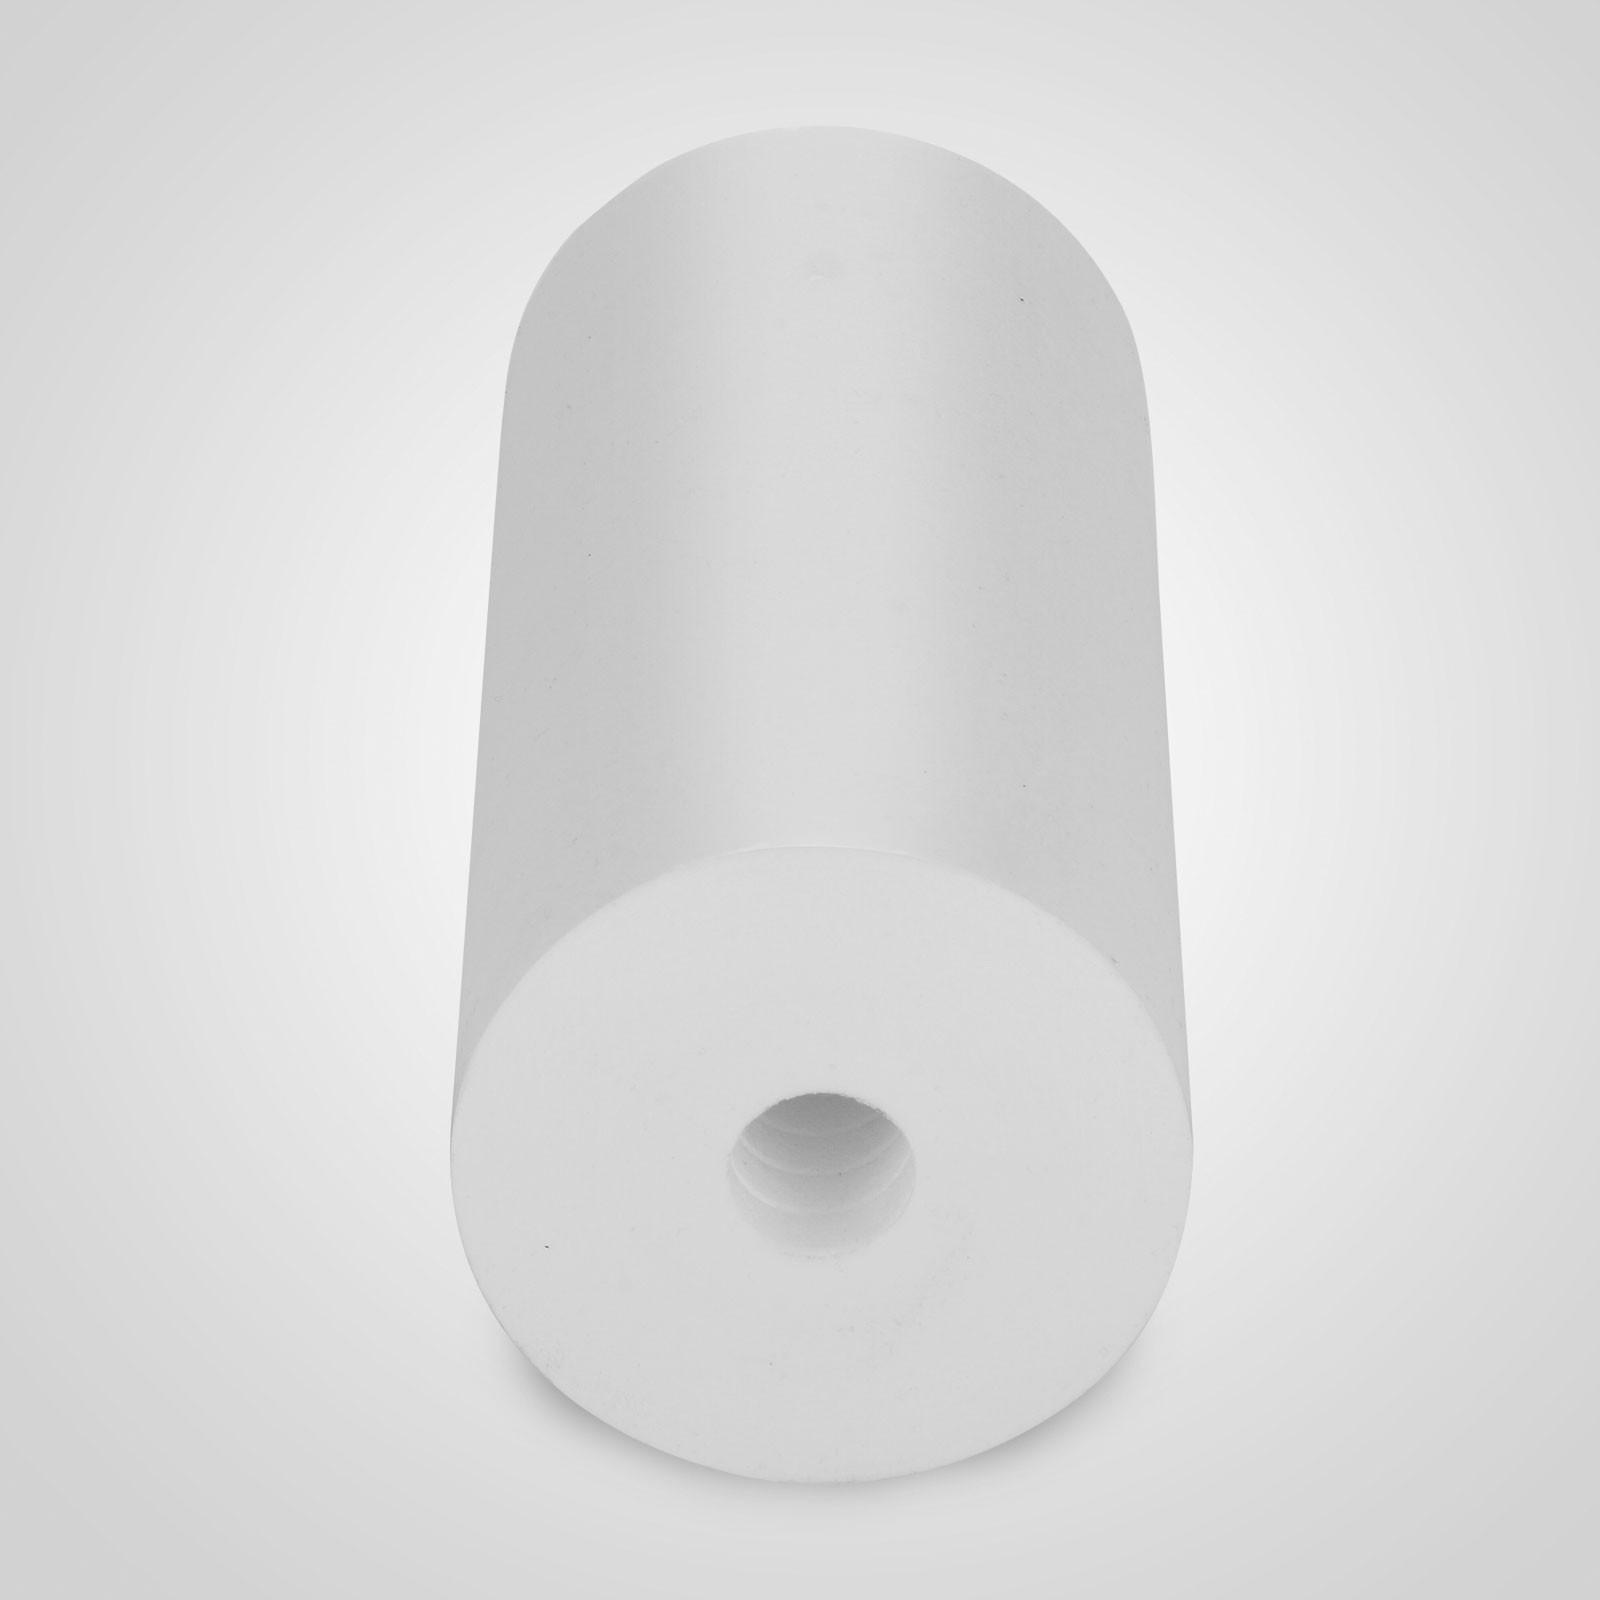 20Pcs-Cartouche-Filtre-a-eau-5-Micron-10-034-X-4-5-034-as-Brita-Bobine-Anti-boue miniature 7